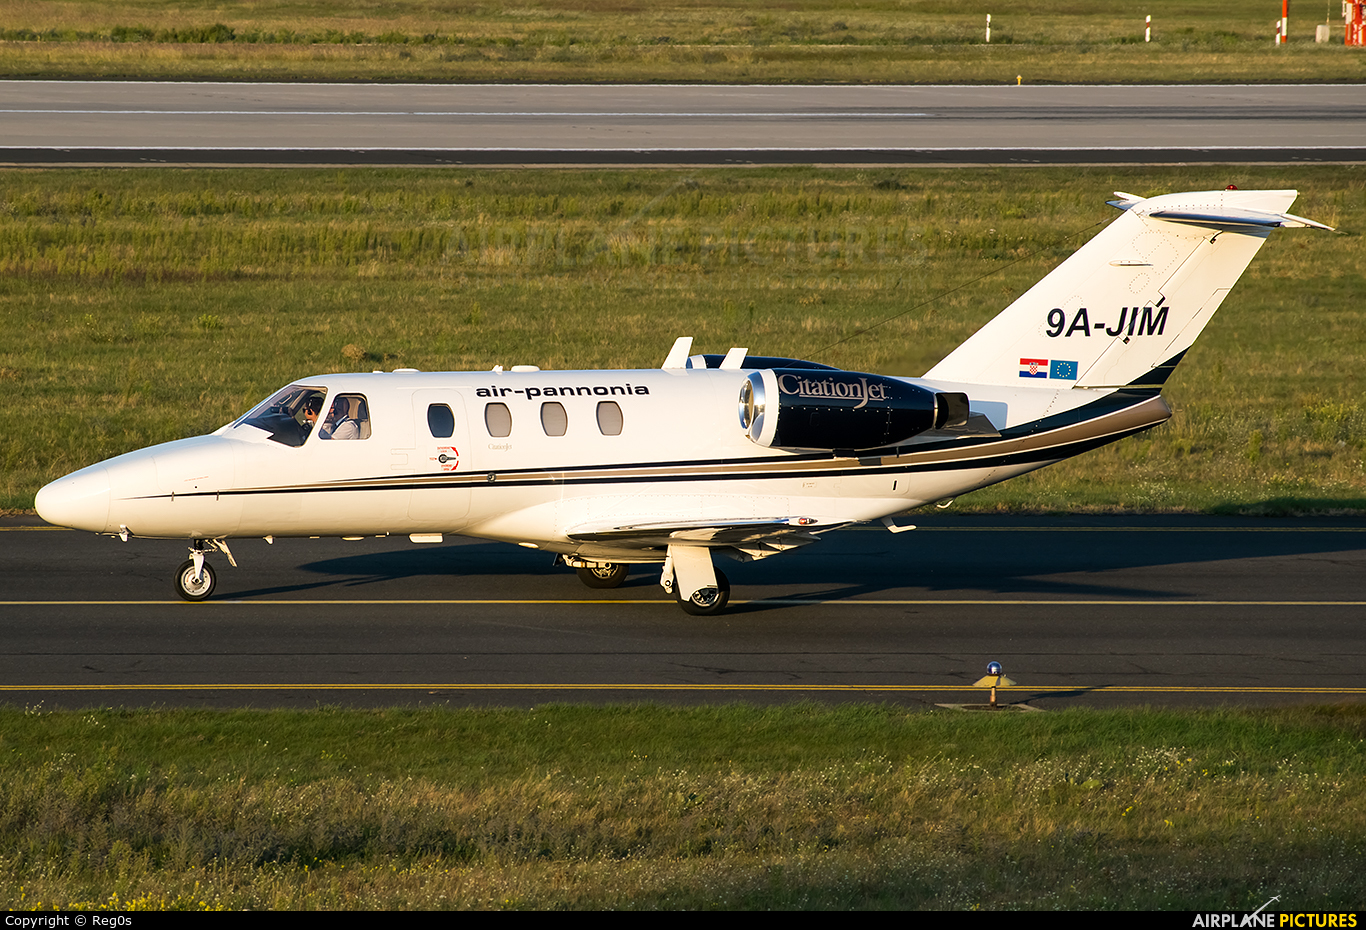 Air Pannonia 9A-JIM aircraft at Budapest Ferenc Liszt International Airport